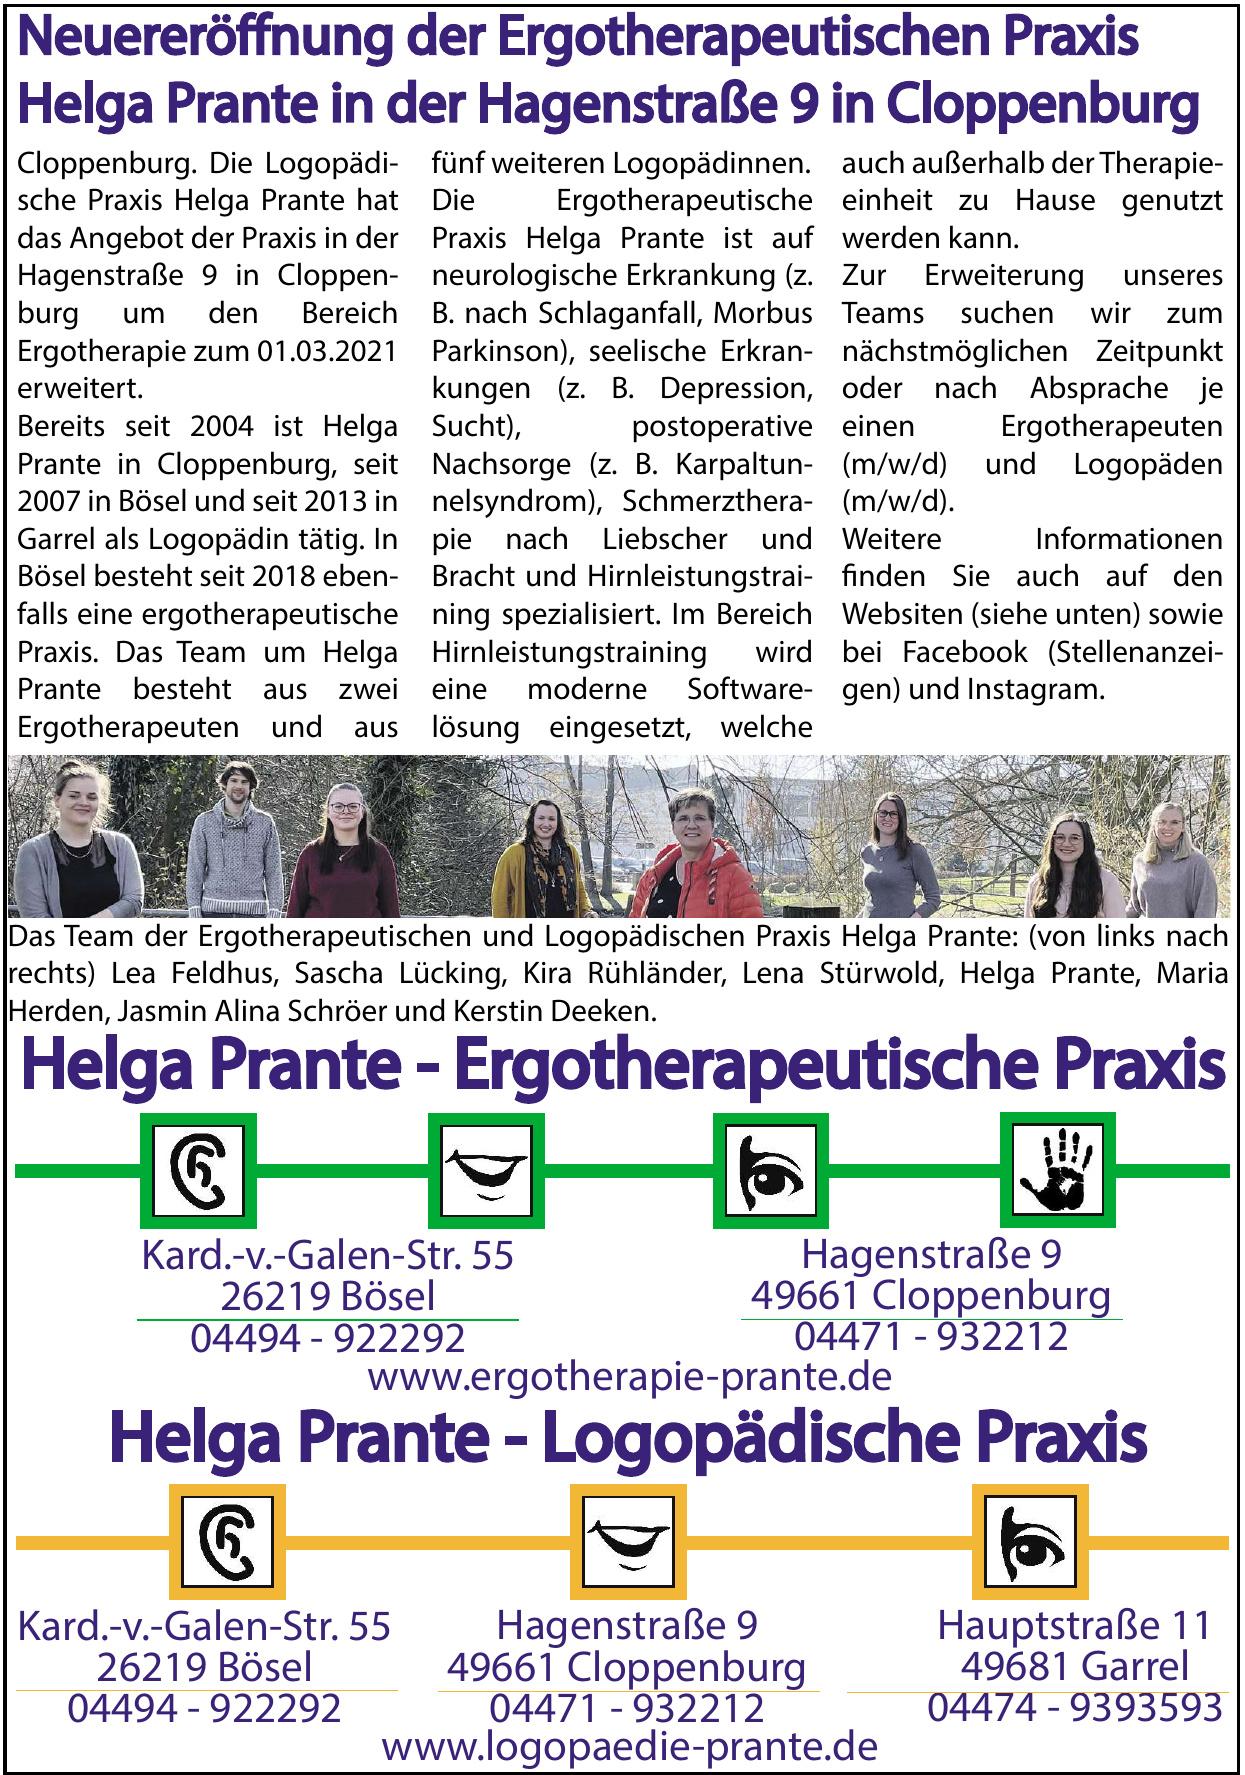 Helga Prante - Ergotherapeutische Praxis